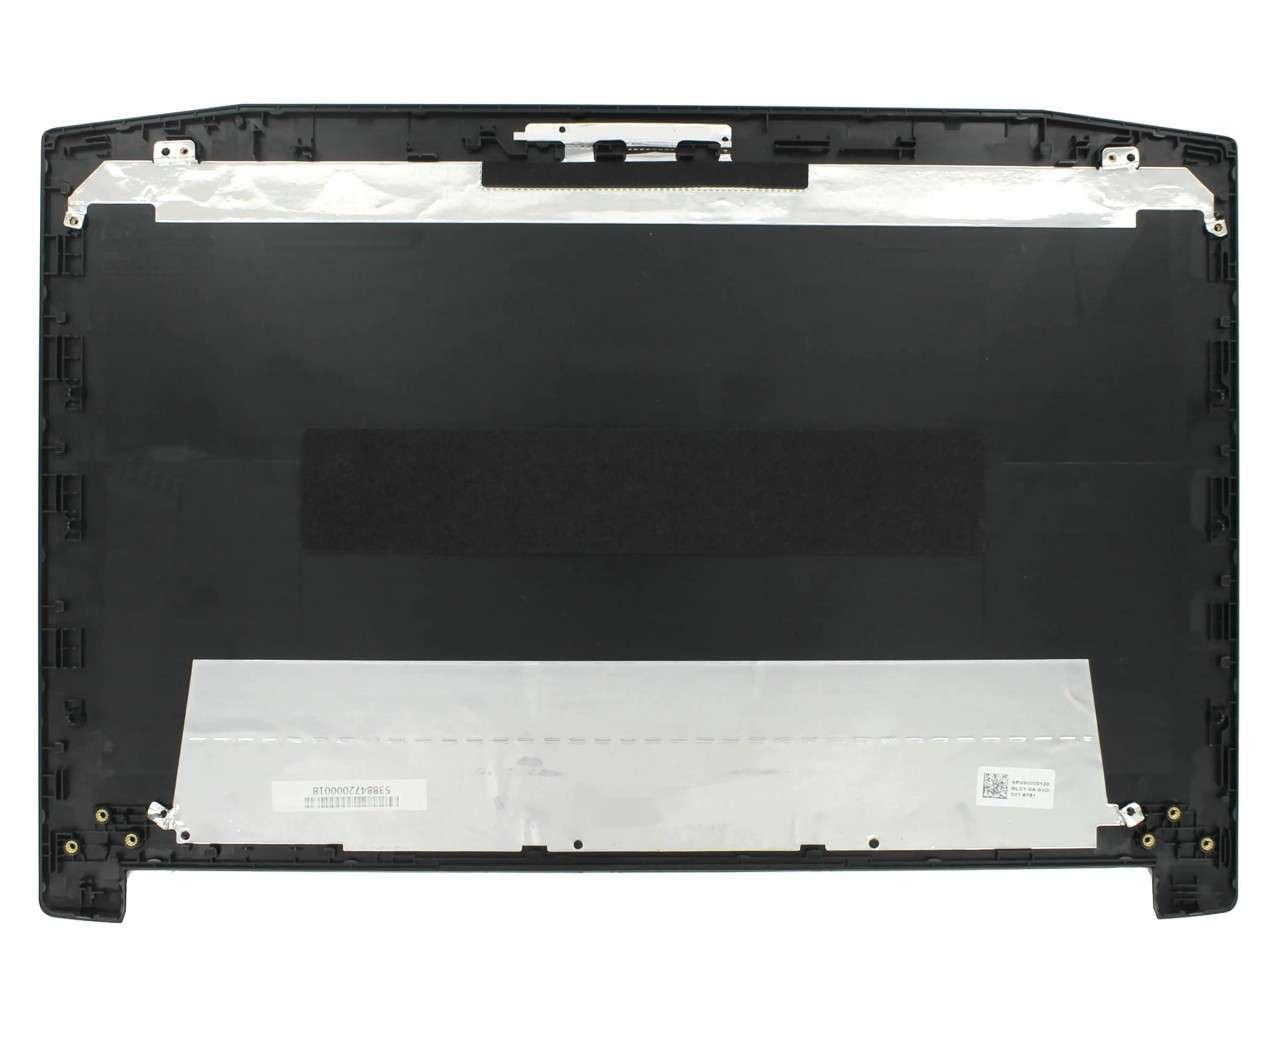 Capac Display BackCover Acer Nitro 5 AN515-51 Carcasa Display imagine powerlaptop.ro 2021